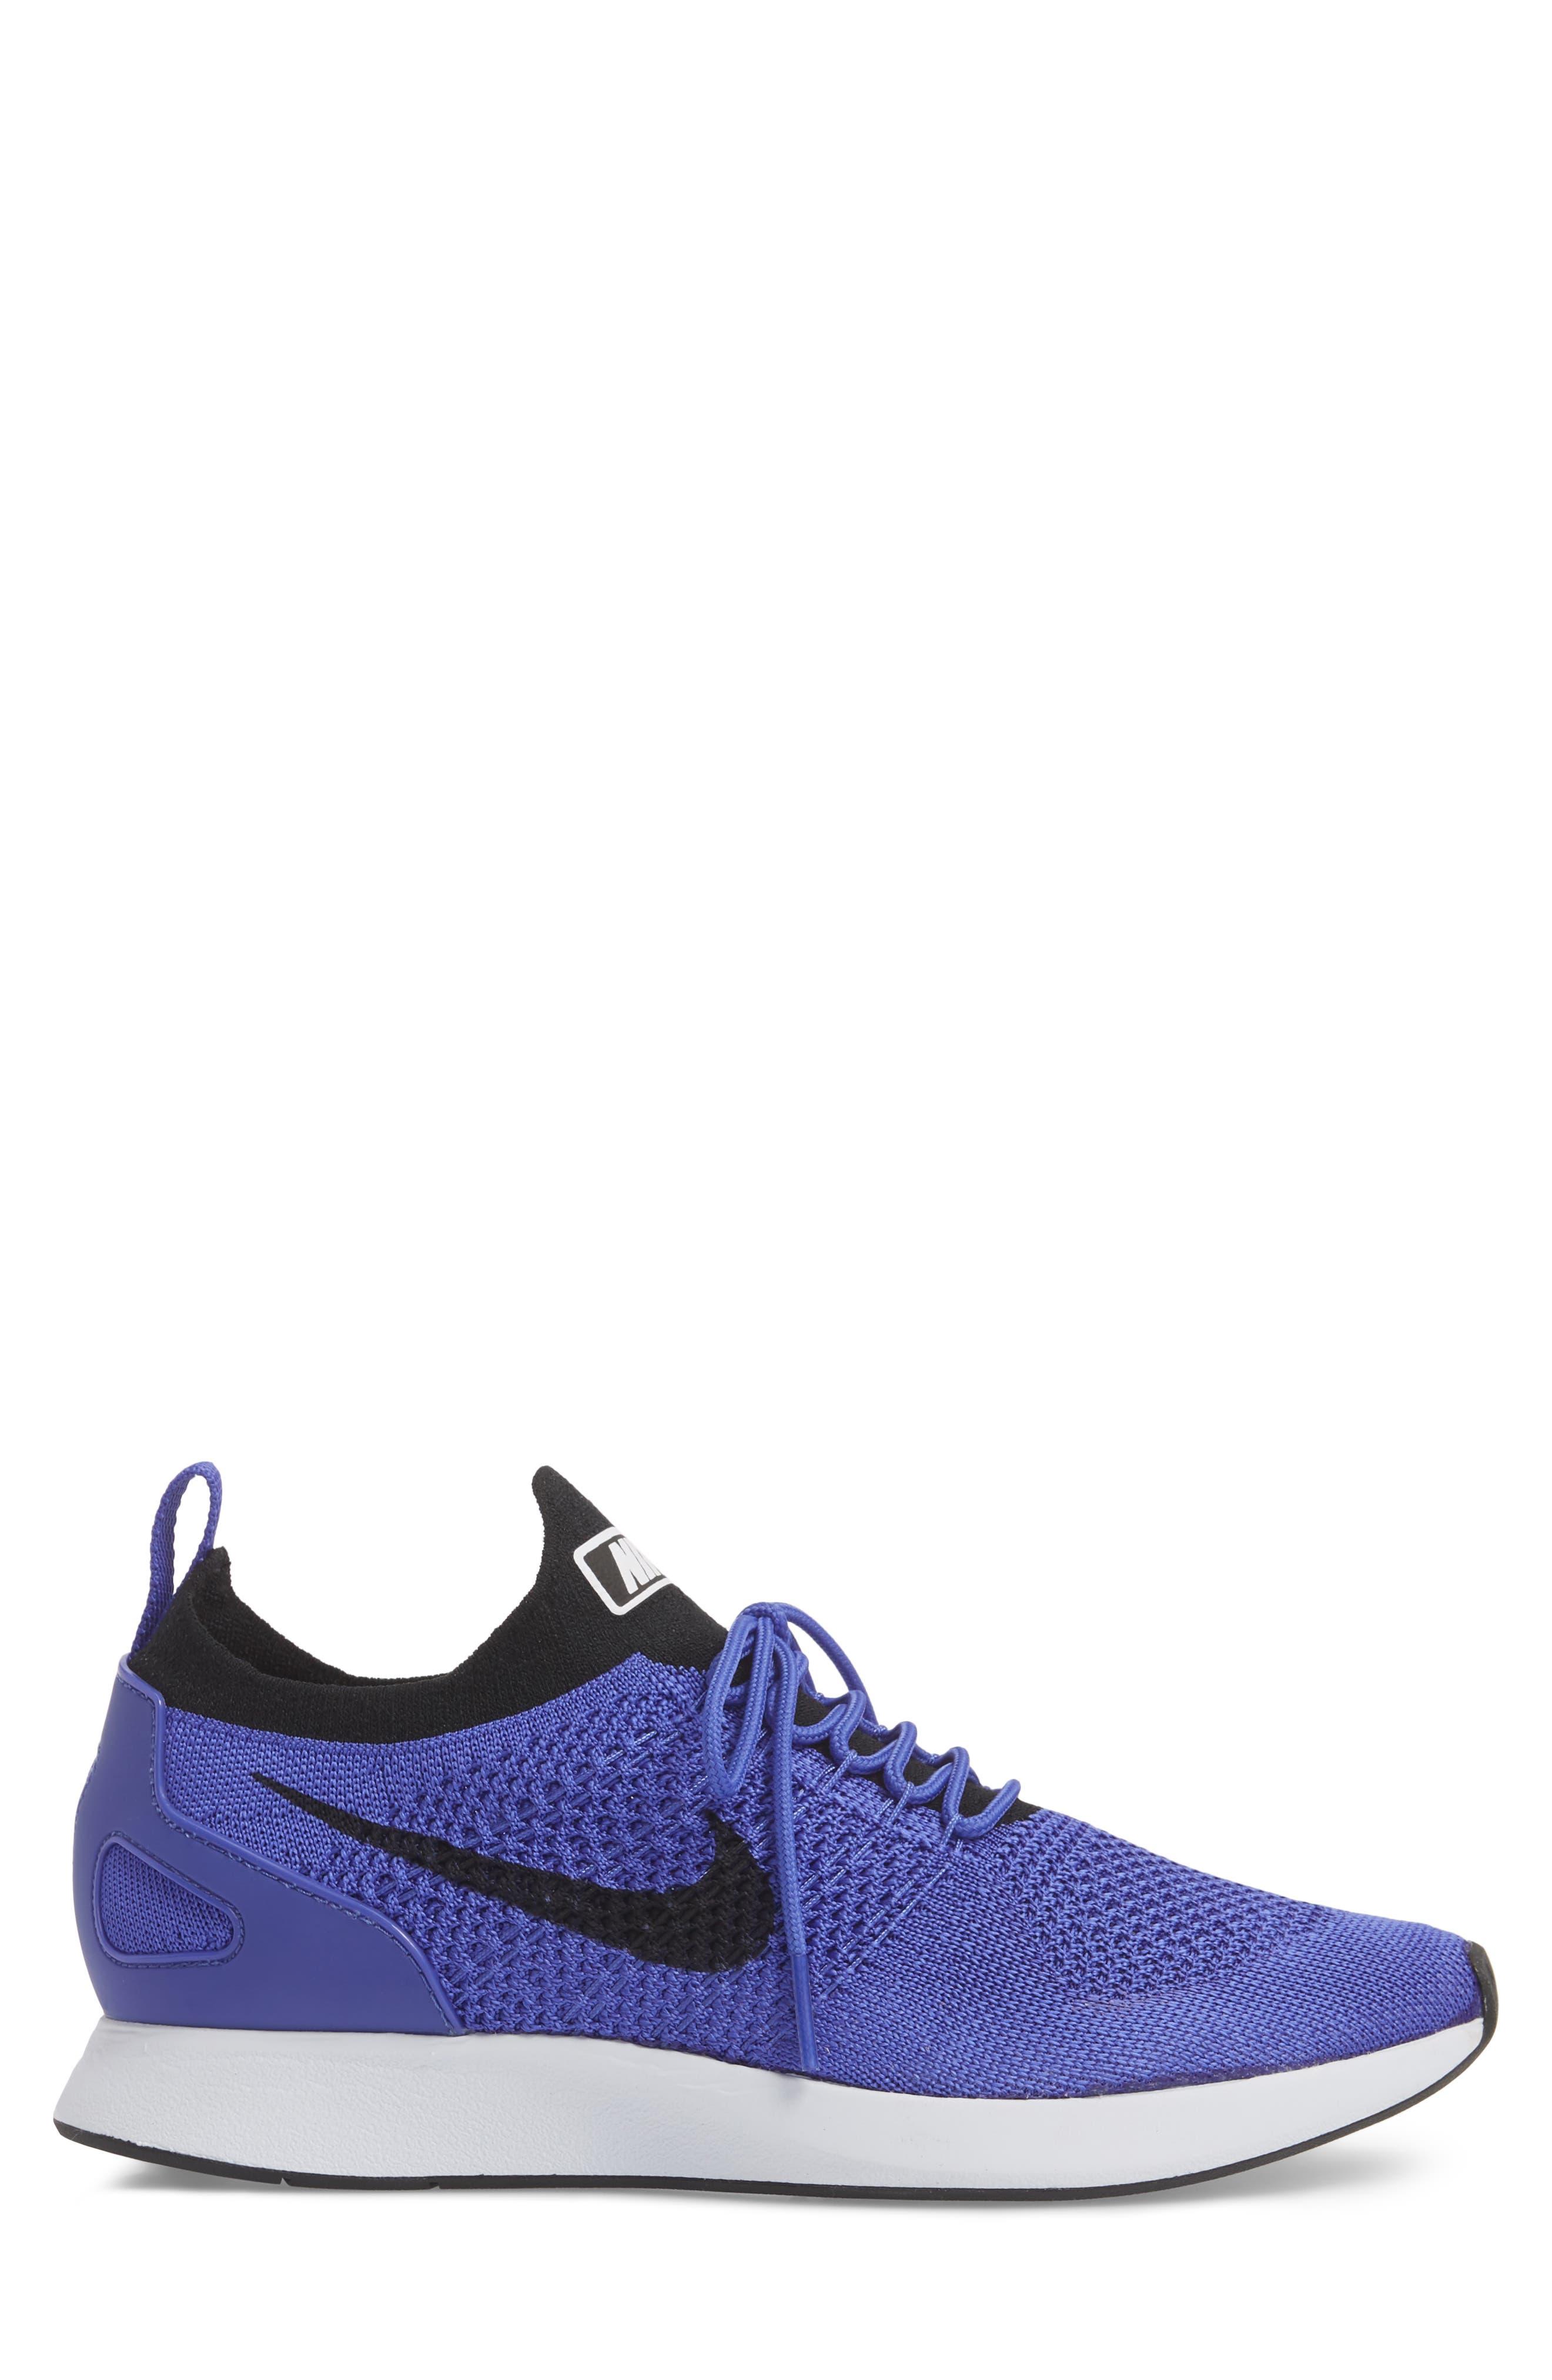 Air Zoom Mariah Flyknit Racer Sneaker,                             Alternate thumbnail 6, color,                             Violet/ Black/ White